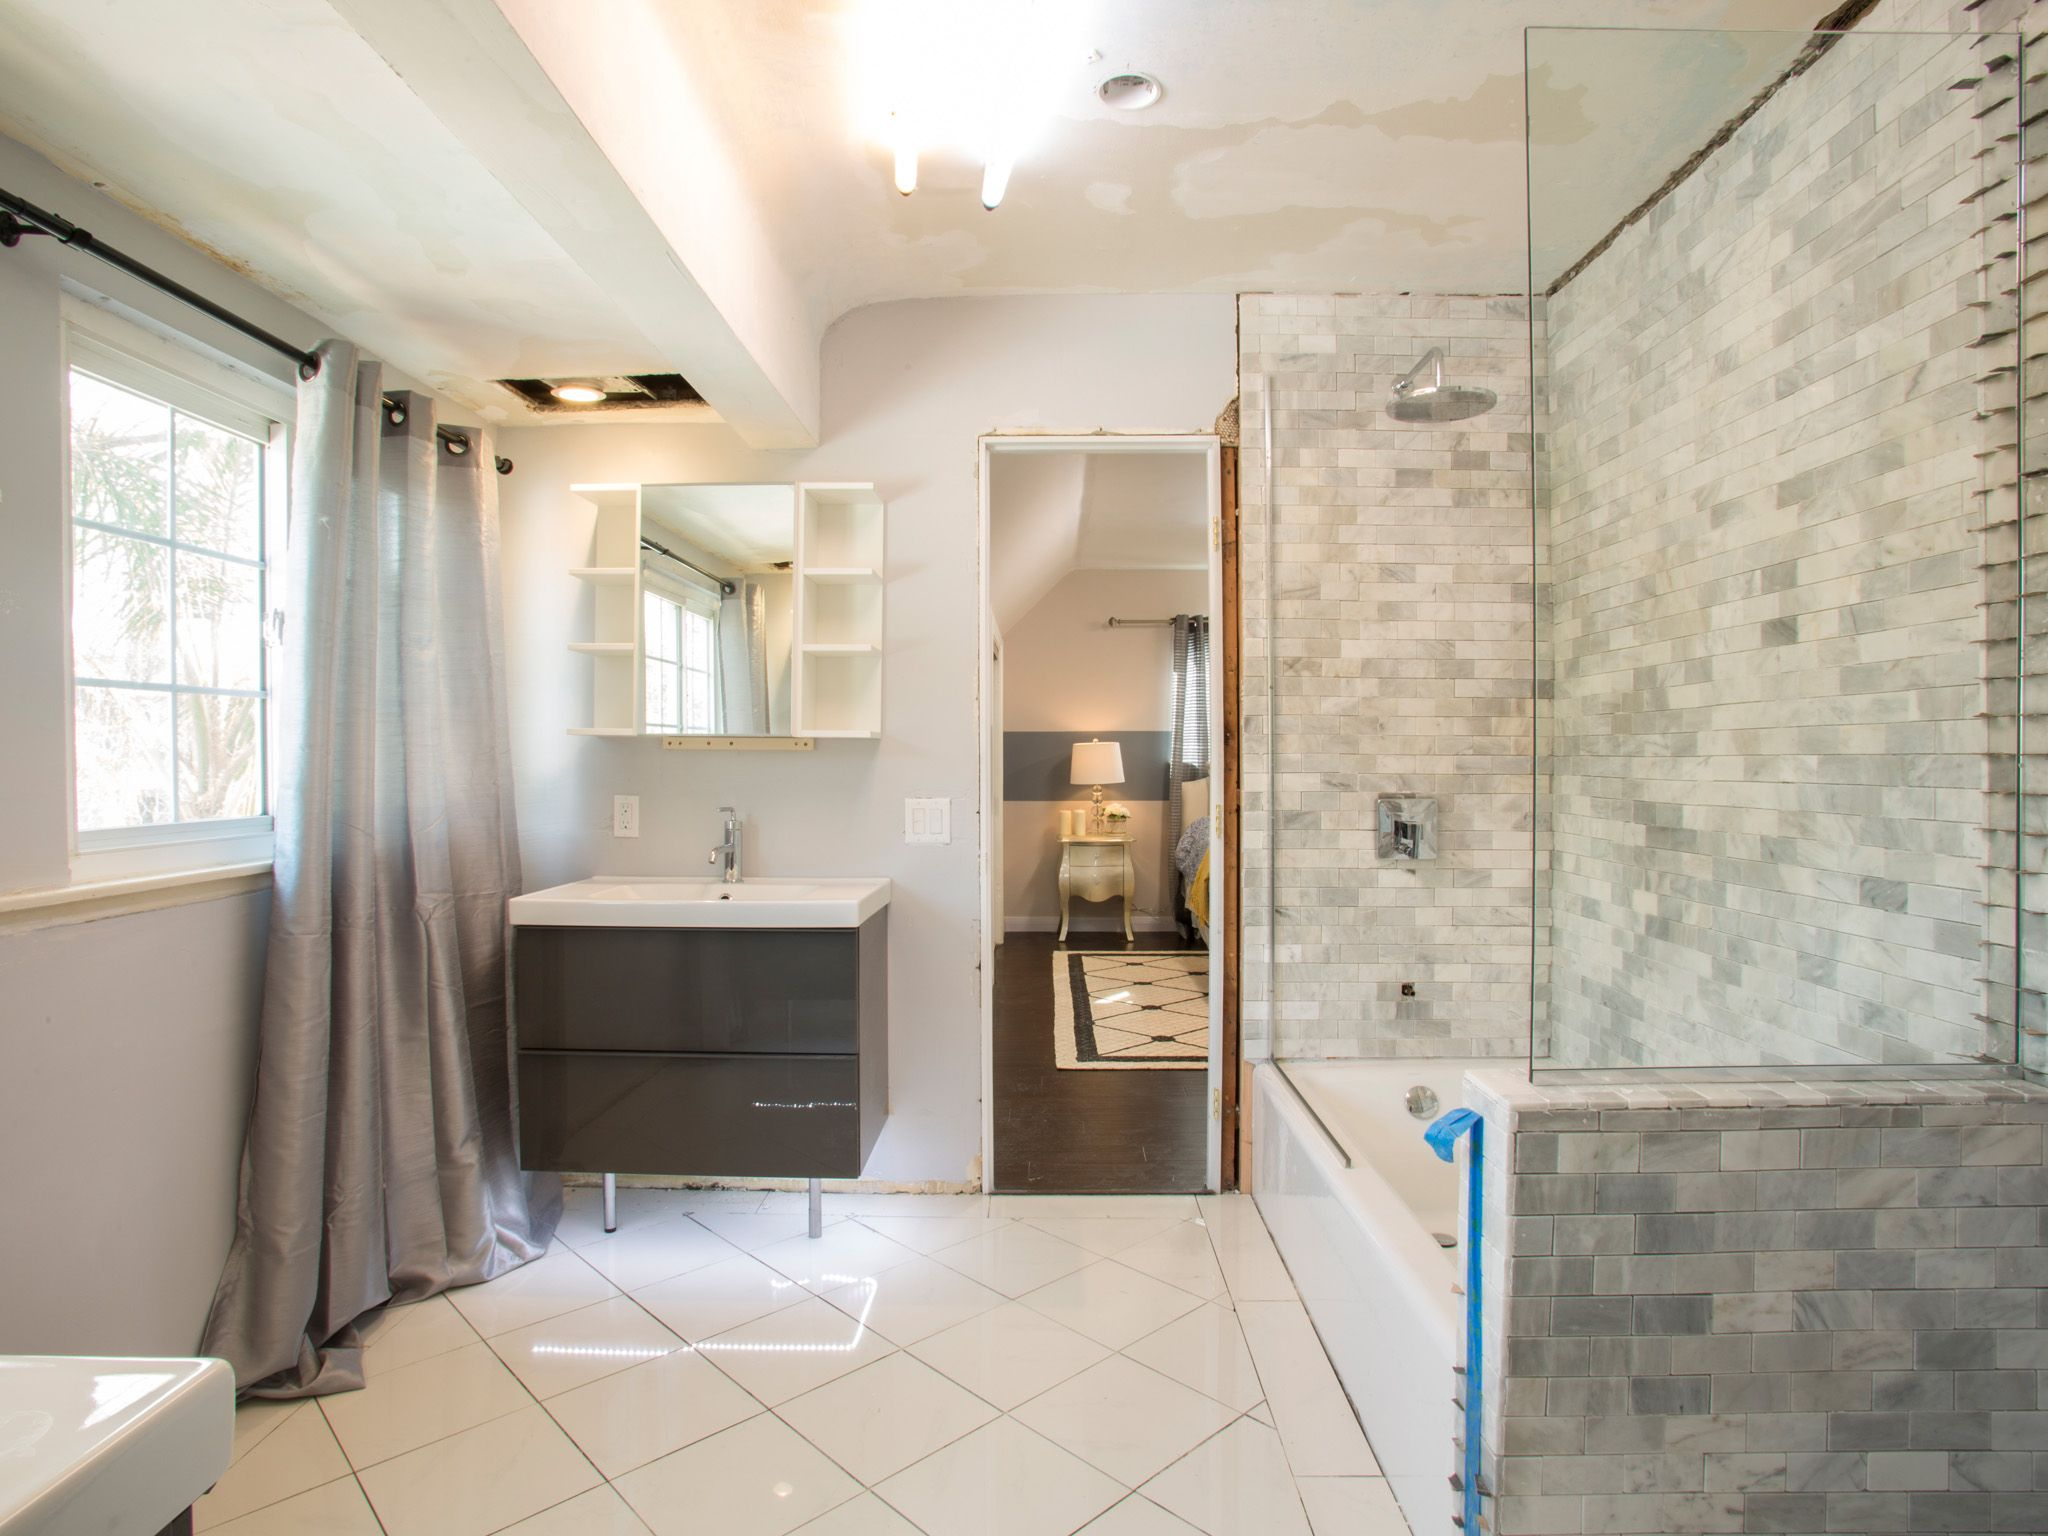 bathroom remodel videos. Bathroom Makeover Ideas, Pictures \u0026 Videos | HGTV Remodel G